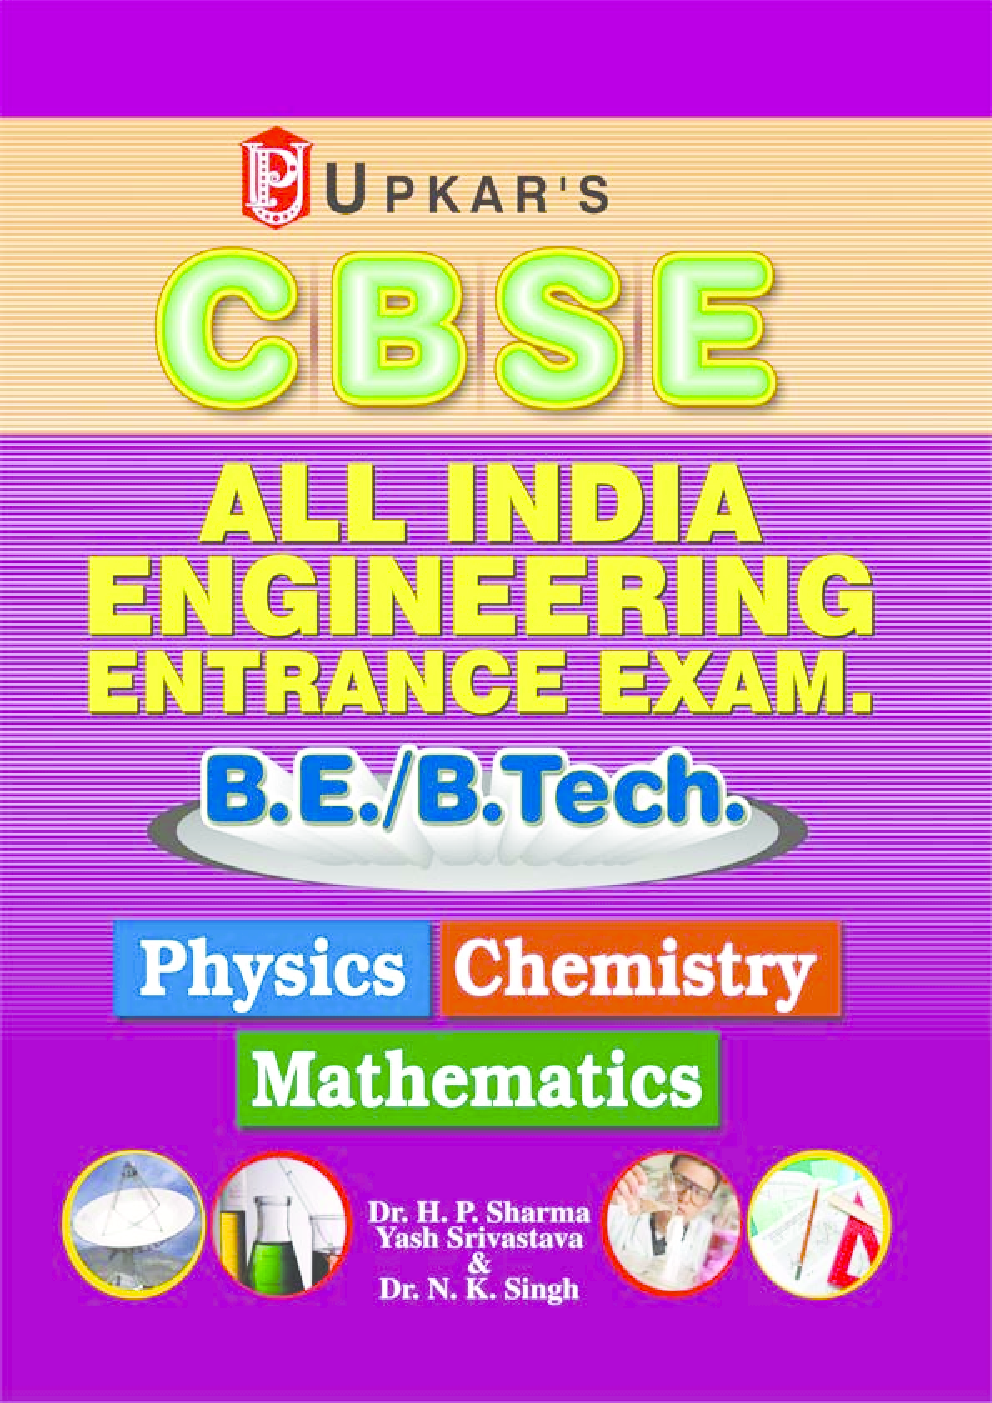 CBSE All India Engineering Entrance Exam. B.E./B.Tech. - Page 1